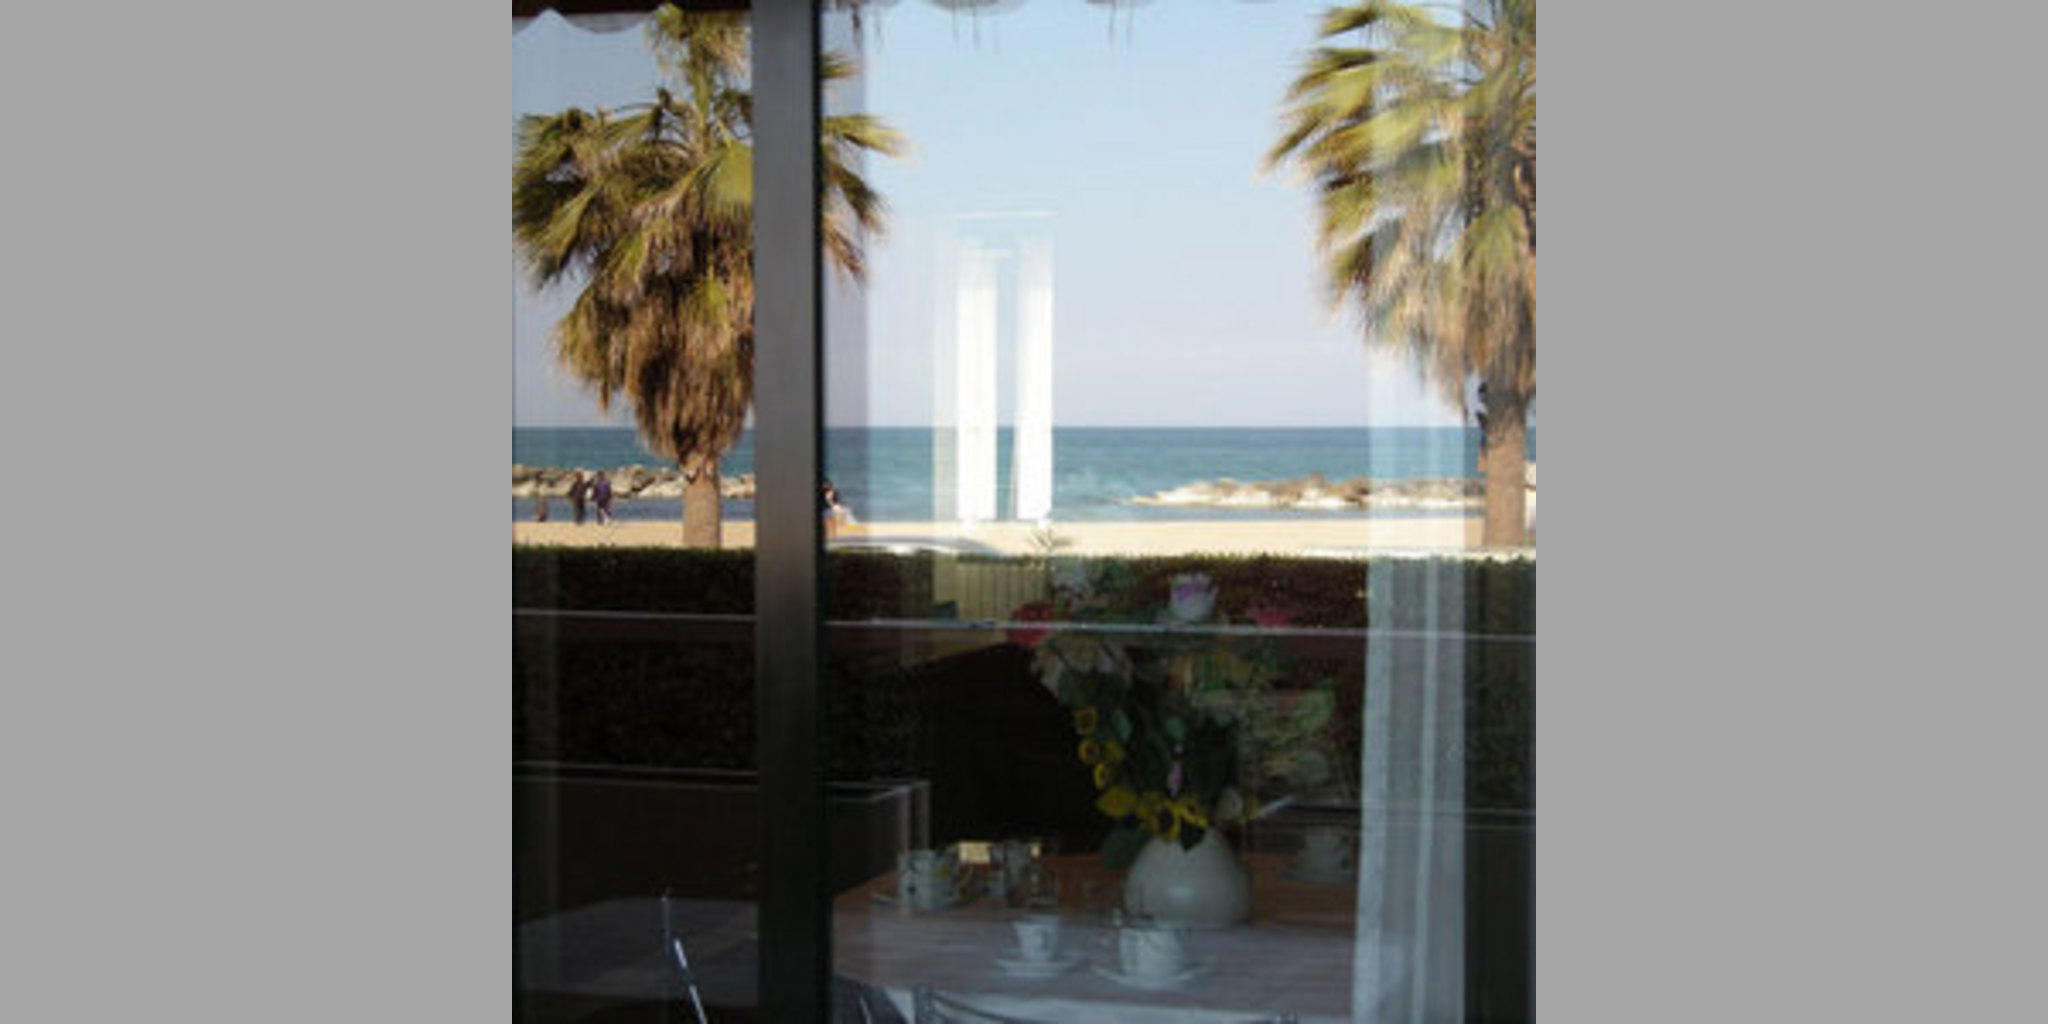 Bed & Breakfast Montesilvano - Montesilvano  Spoltore